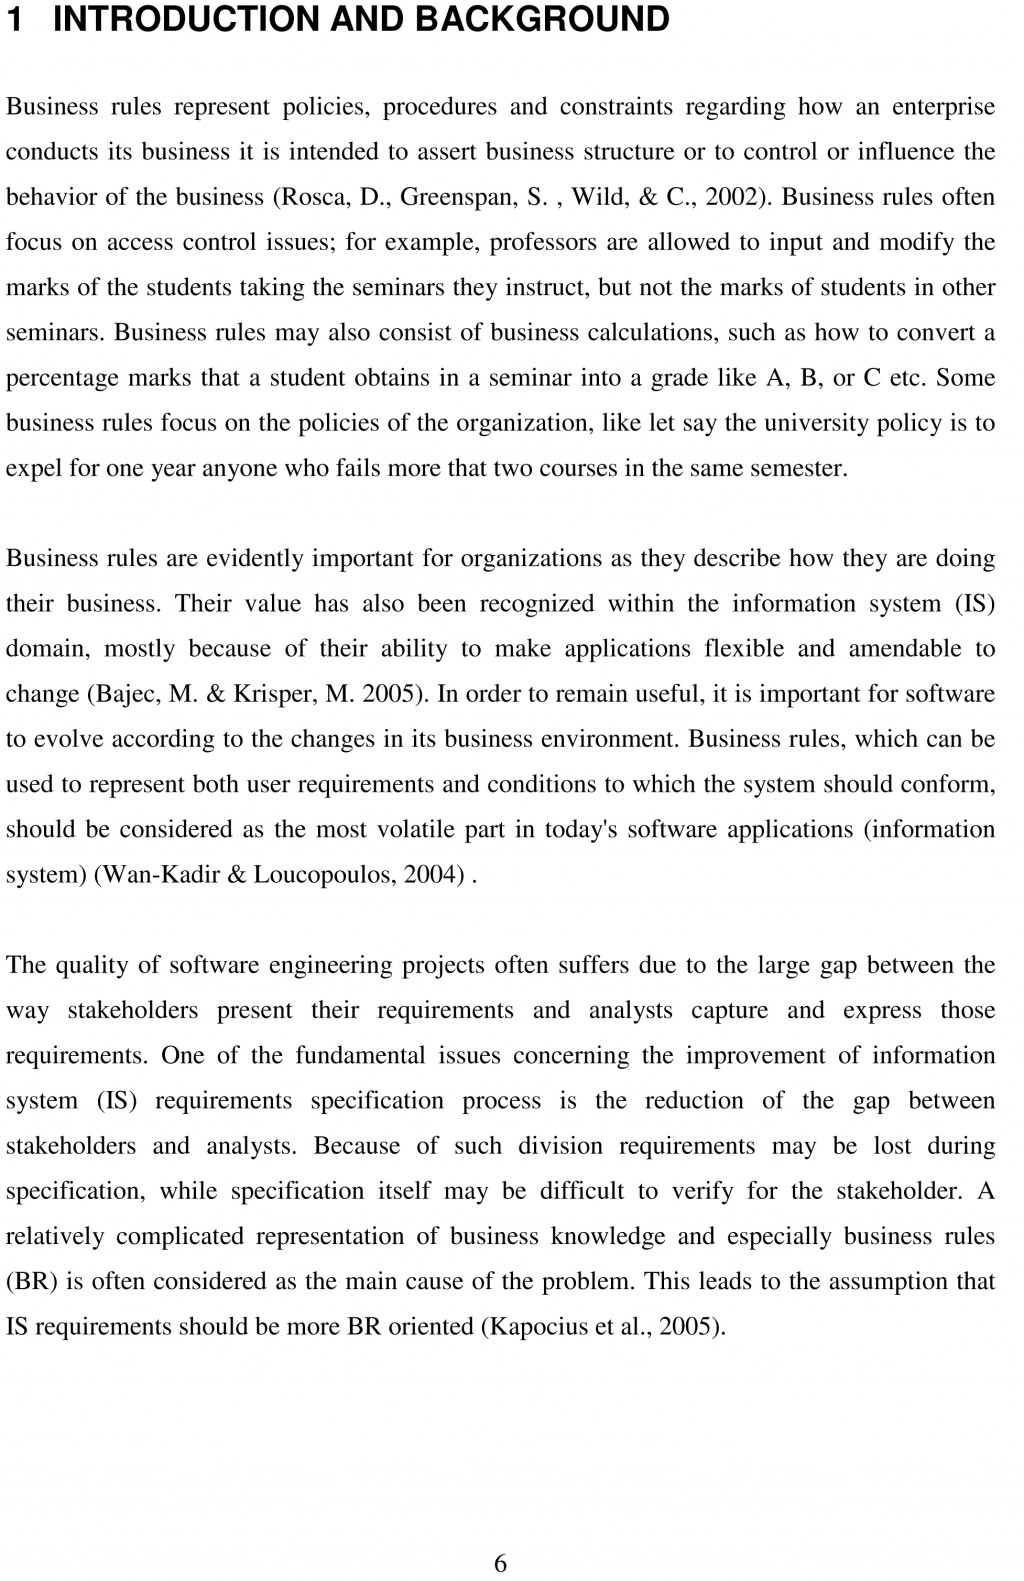 012 Essay Example Sample Act Essays Thesis Wonderful New Large